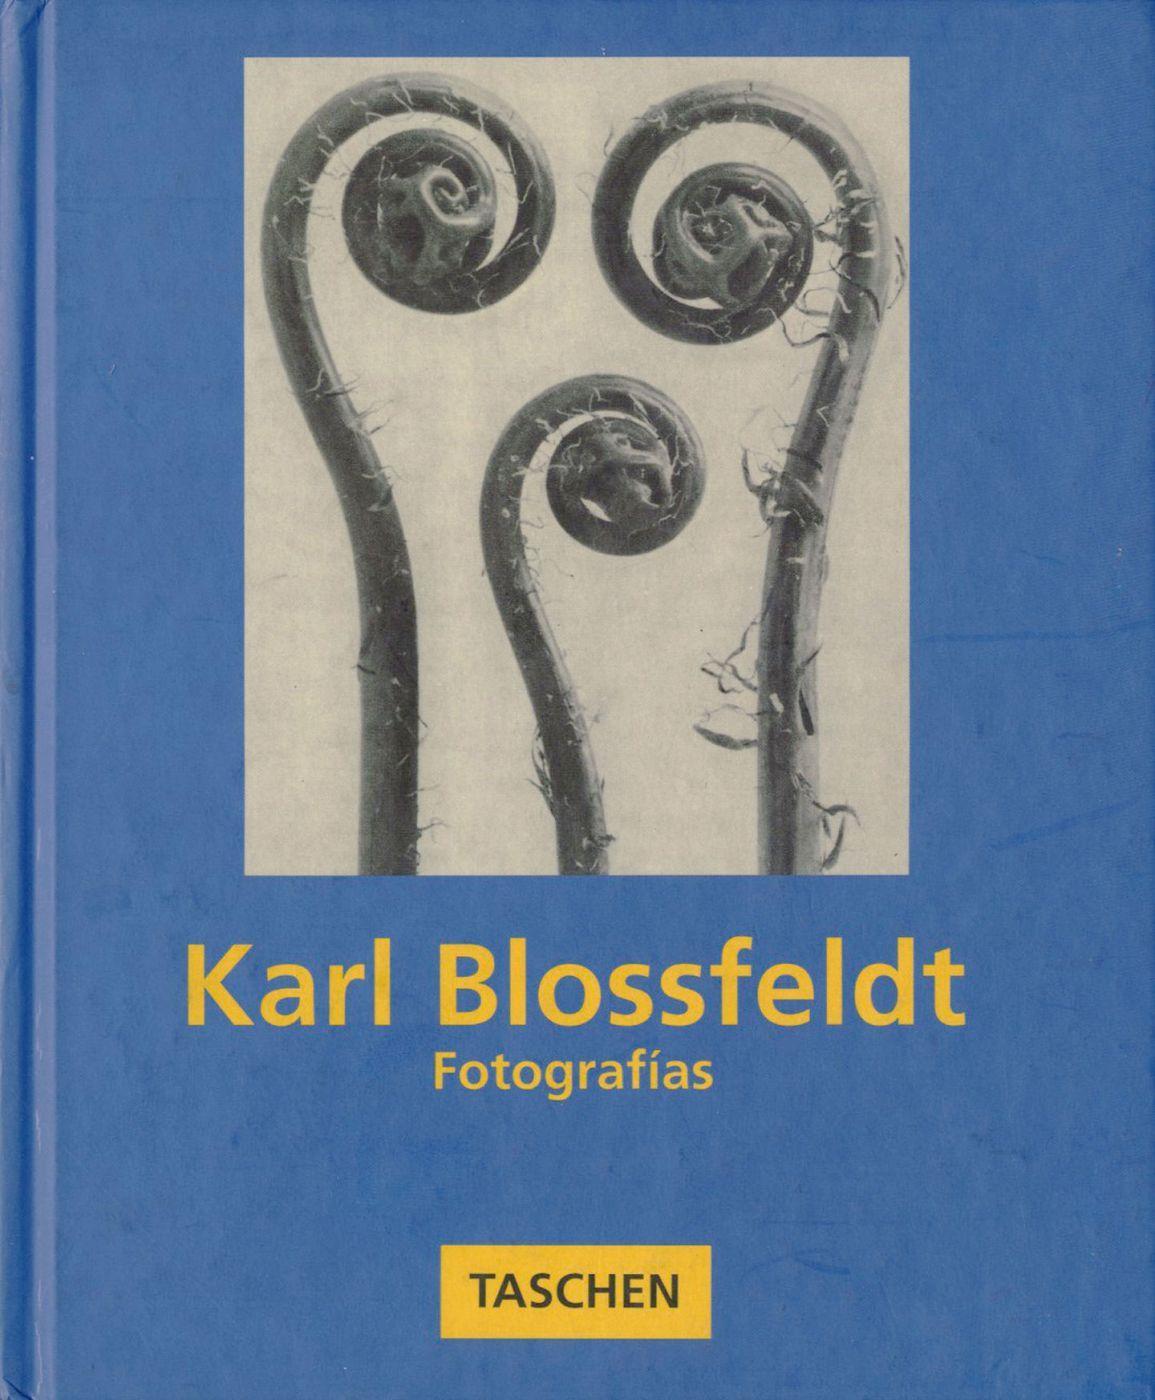 Karl Blossfeldt: Fotografías - BLOSSFELDT, Karl, SACHSSE, Rolf